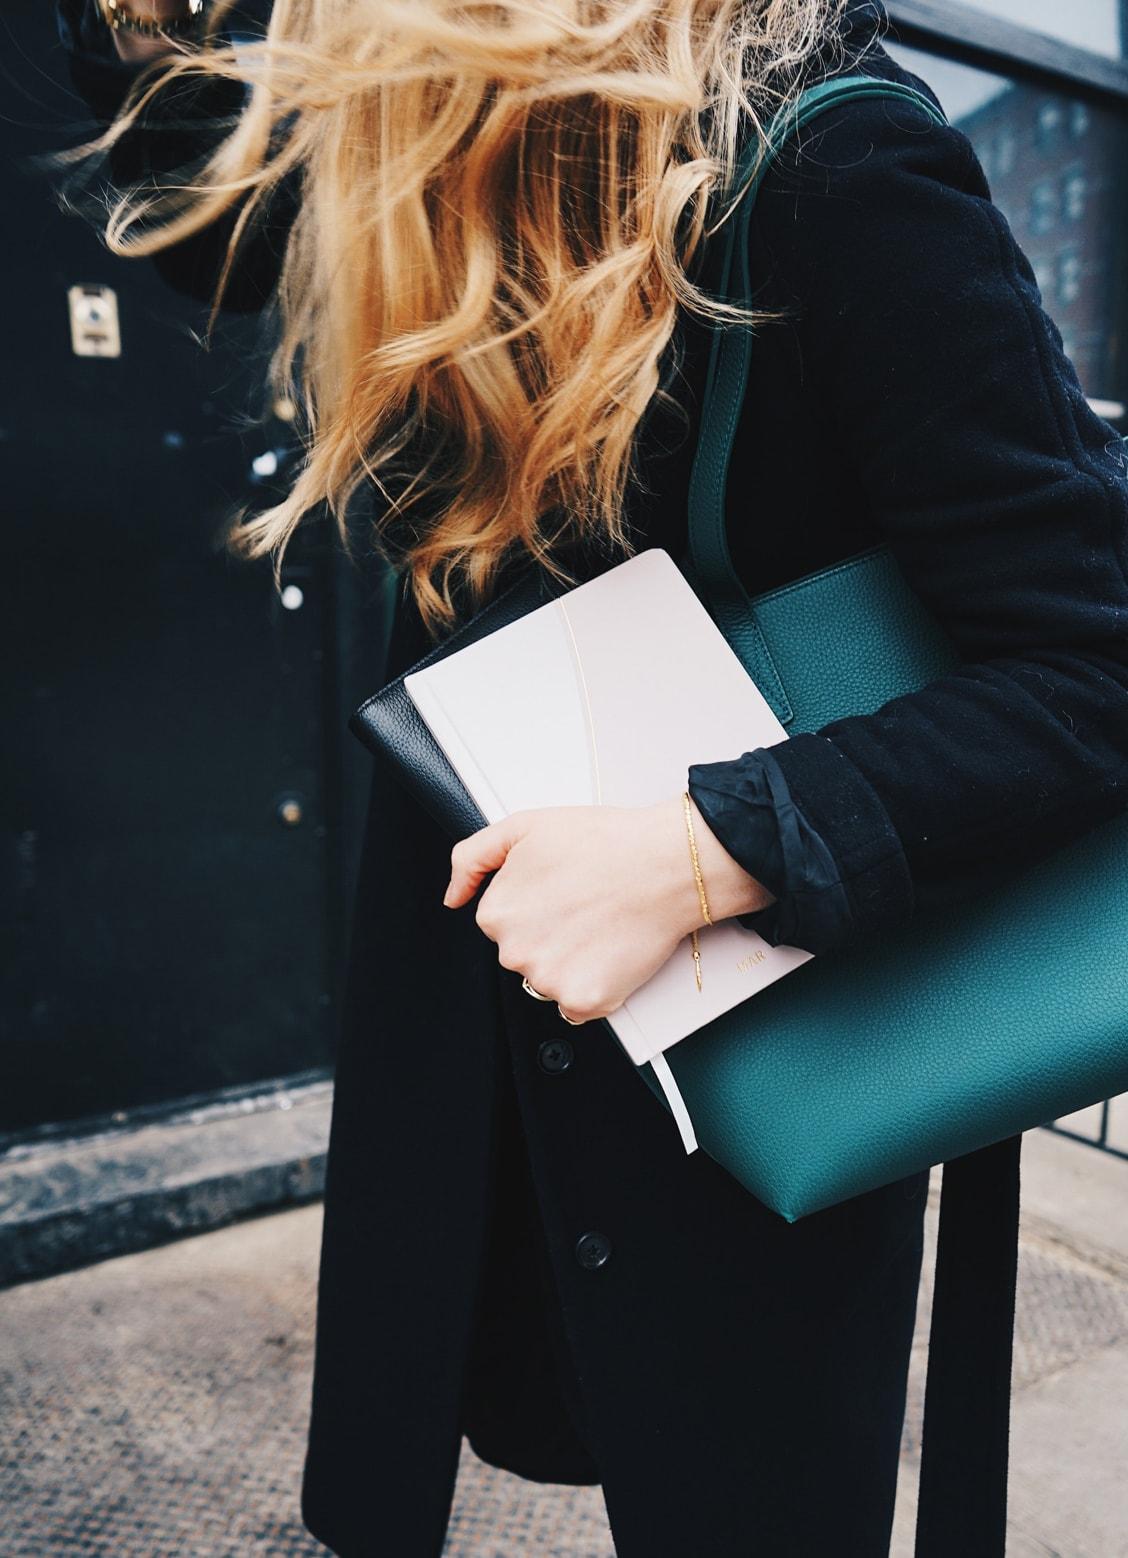 Kate holding books under arm